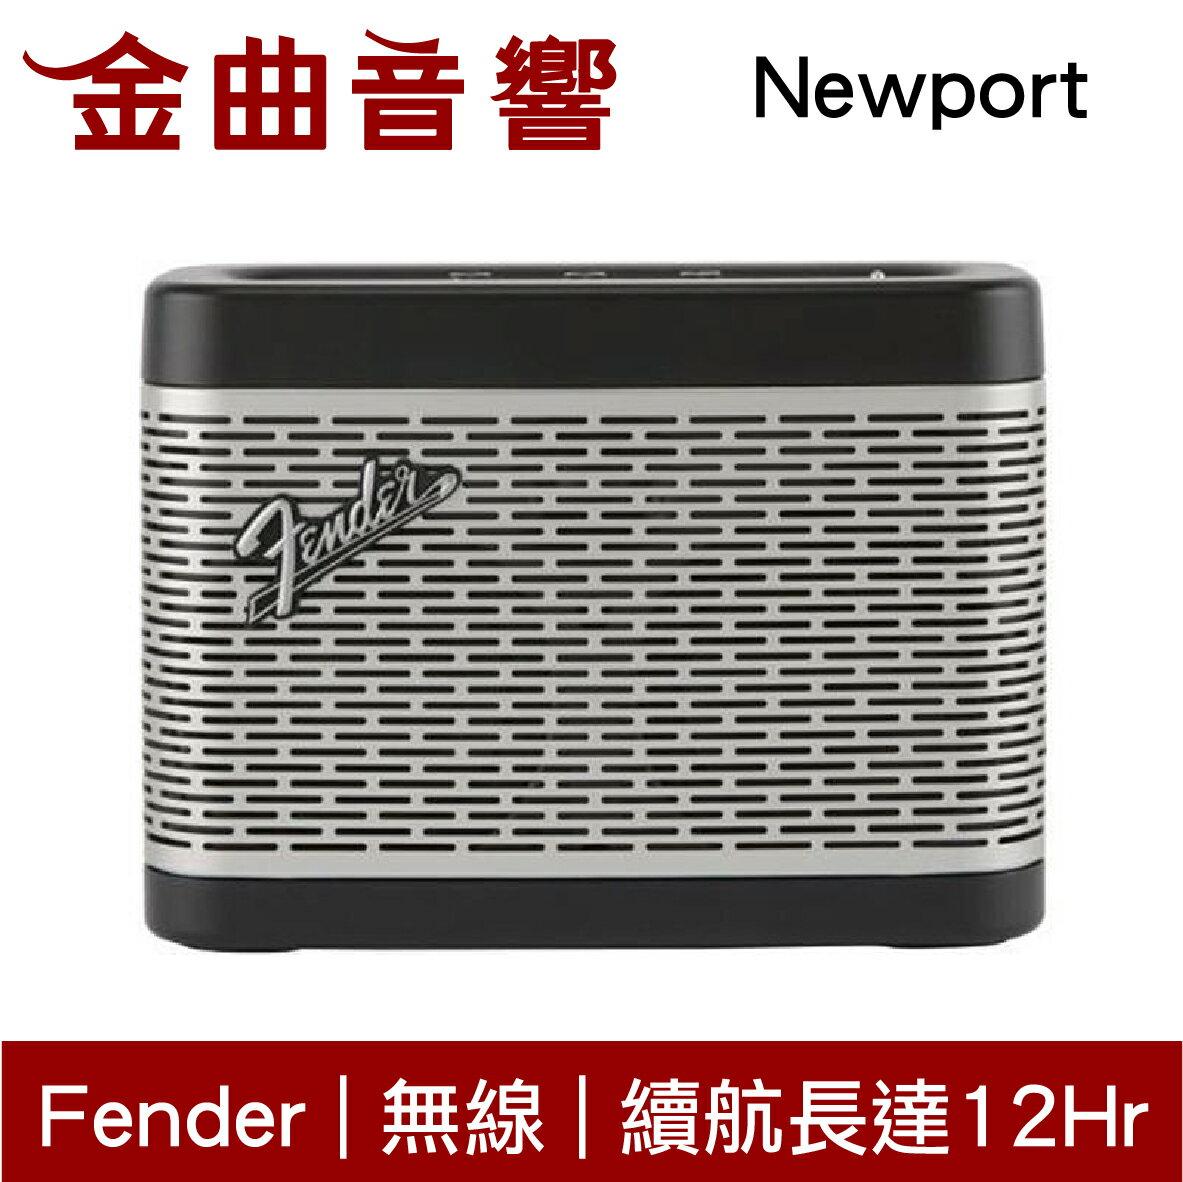 Fender Newport 多色 藍牙喇叭 無線 充電式 可攜帶   金曲音響